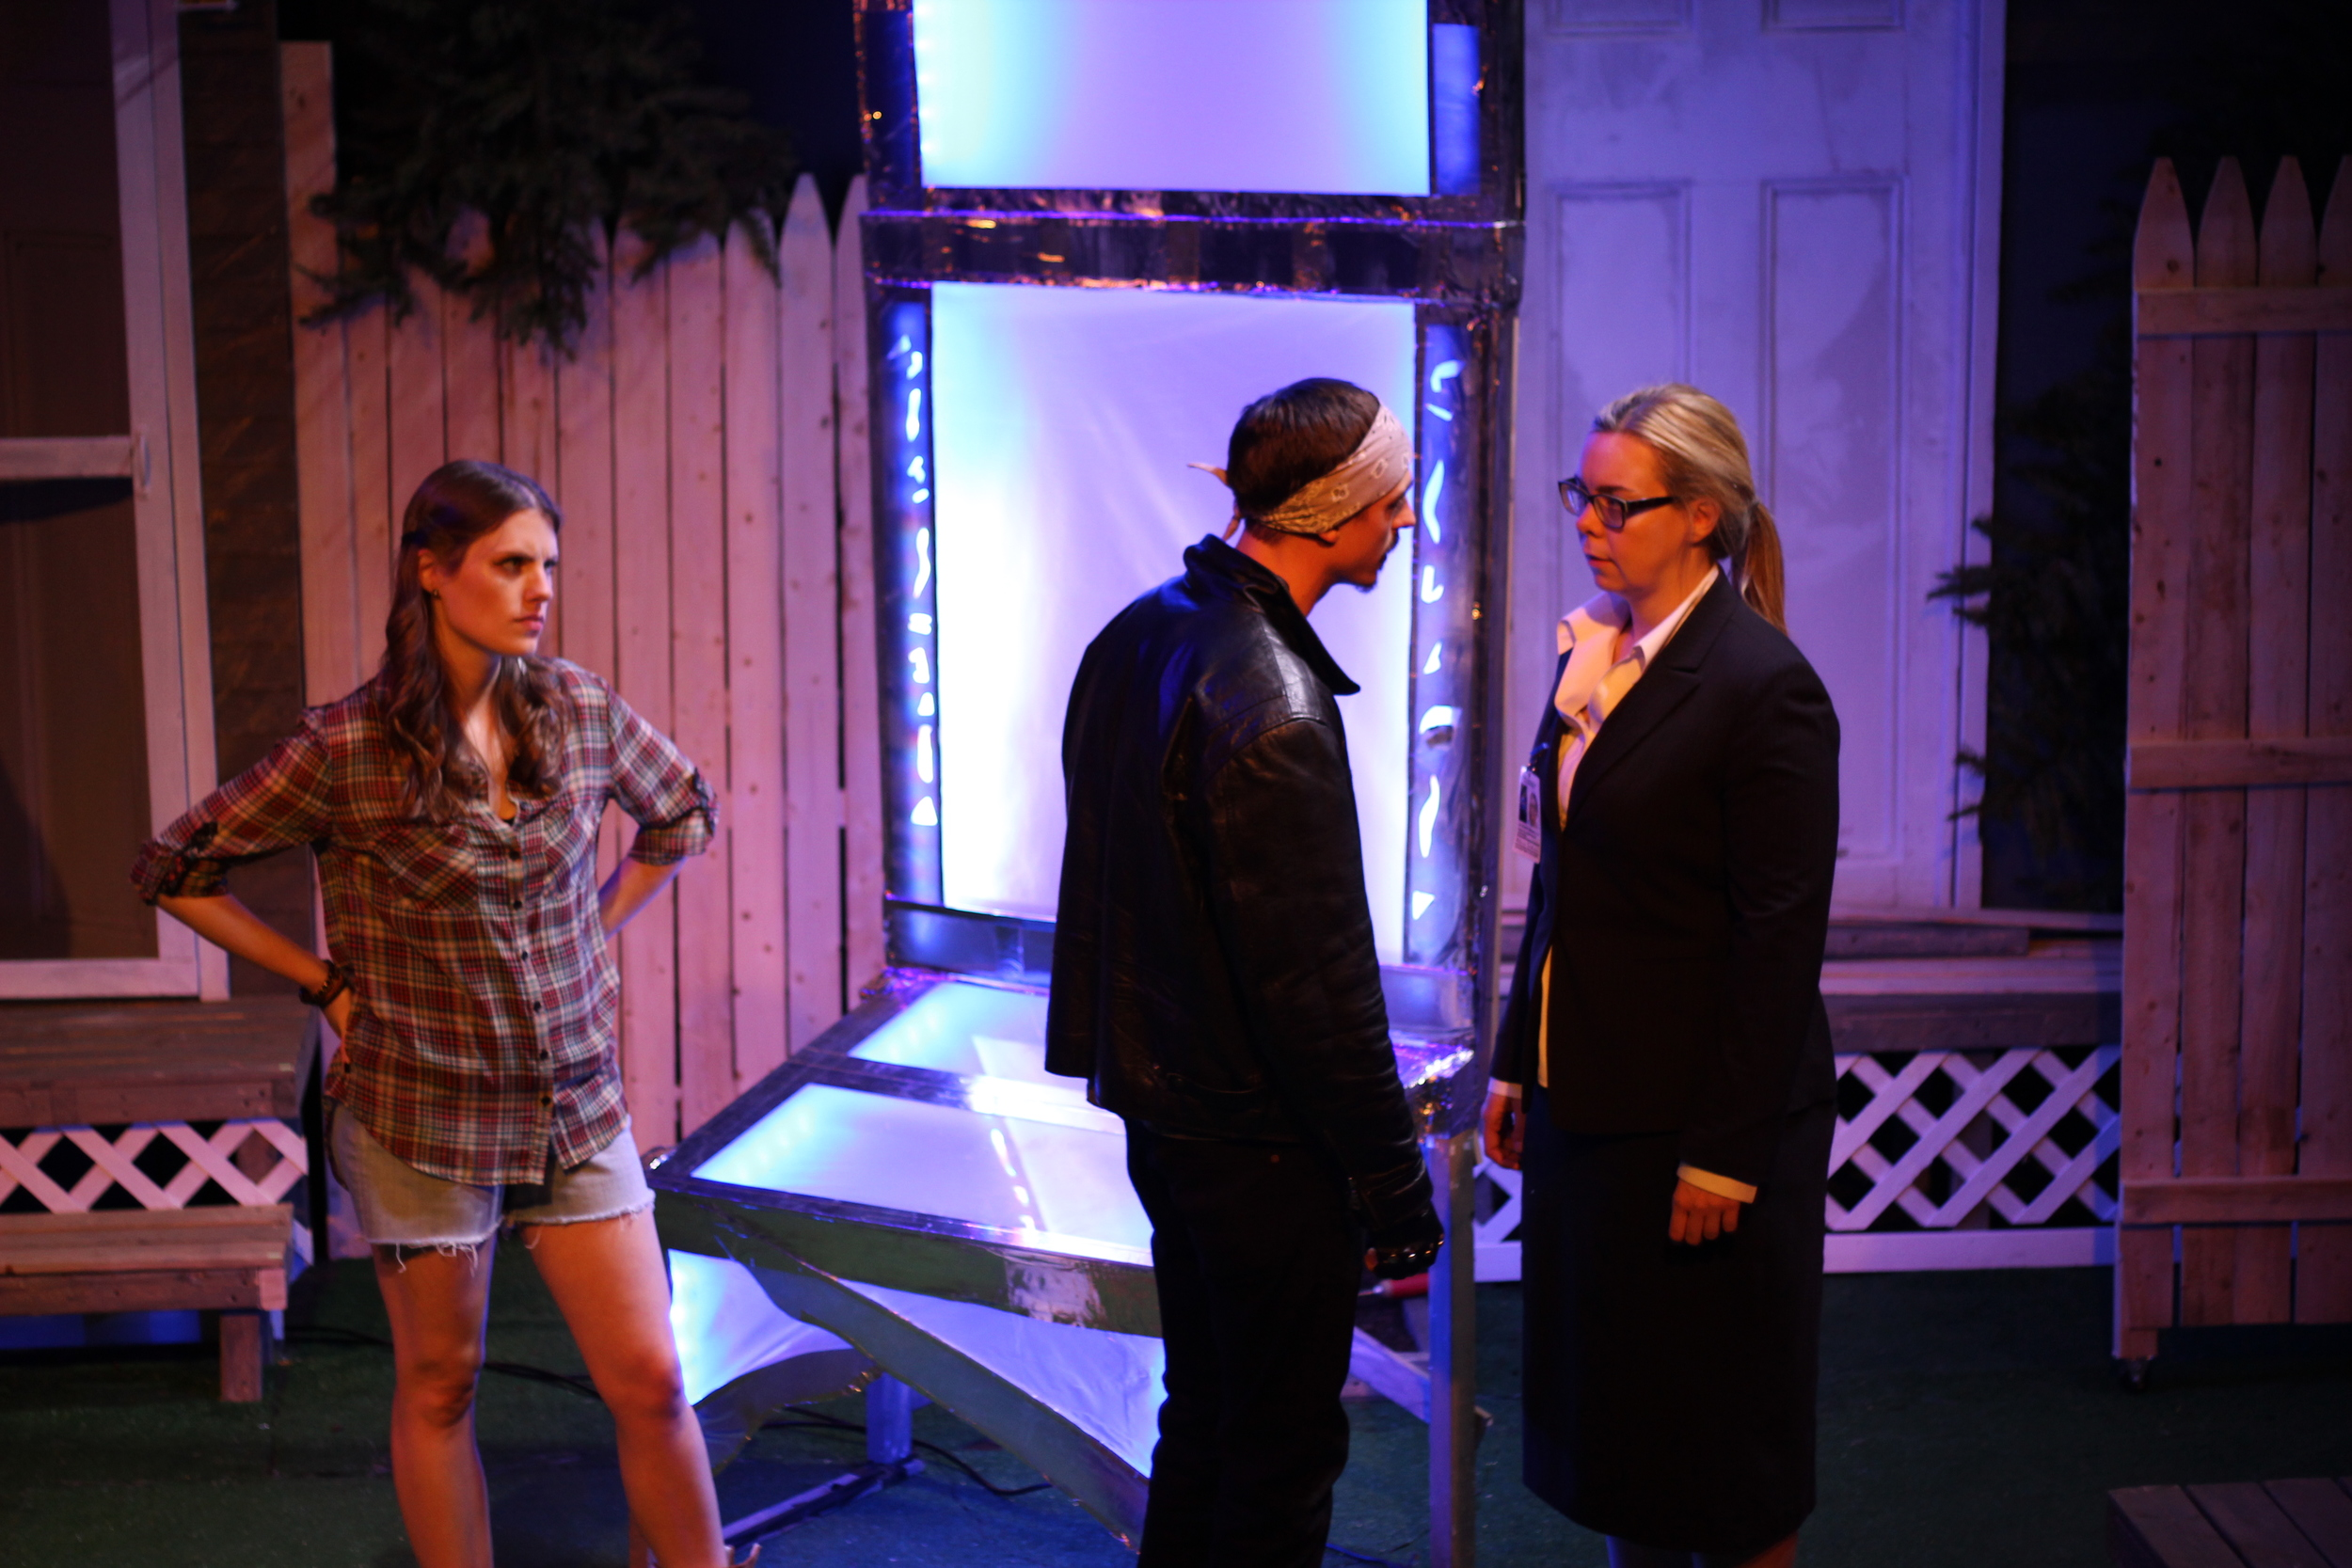 Louise Hamill as Talia, Michael Knowlton as Blake, and Gillian Mackay-Smith as Melanie; Photo by Jessie Baxter